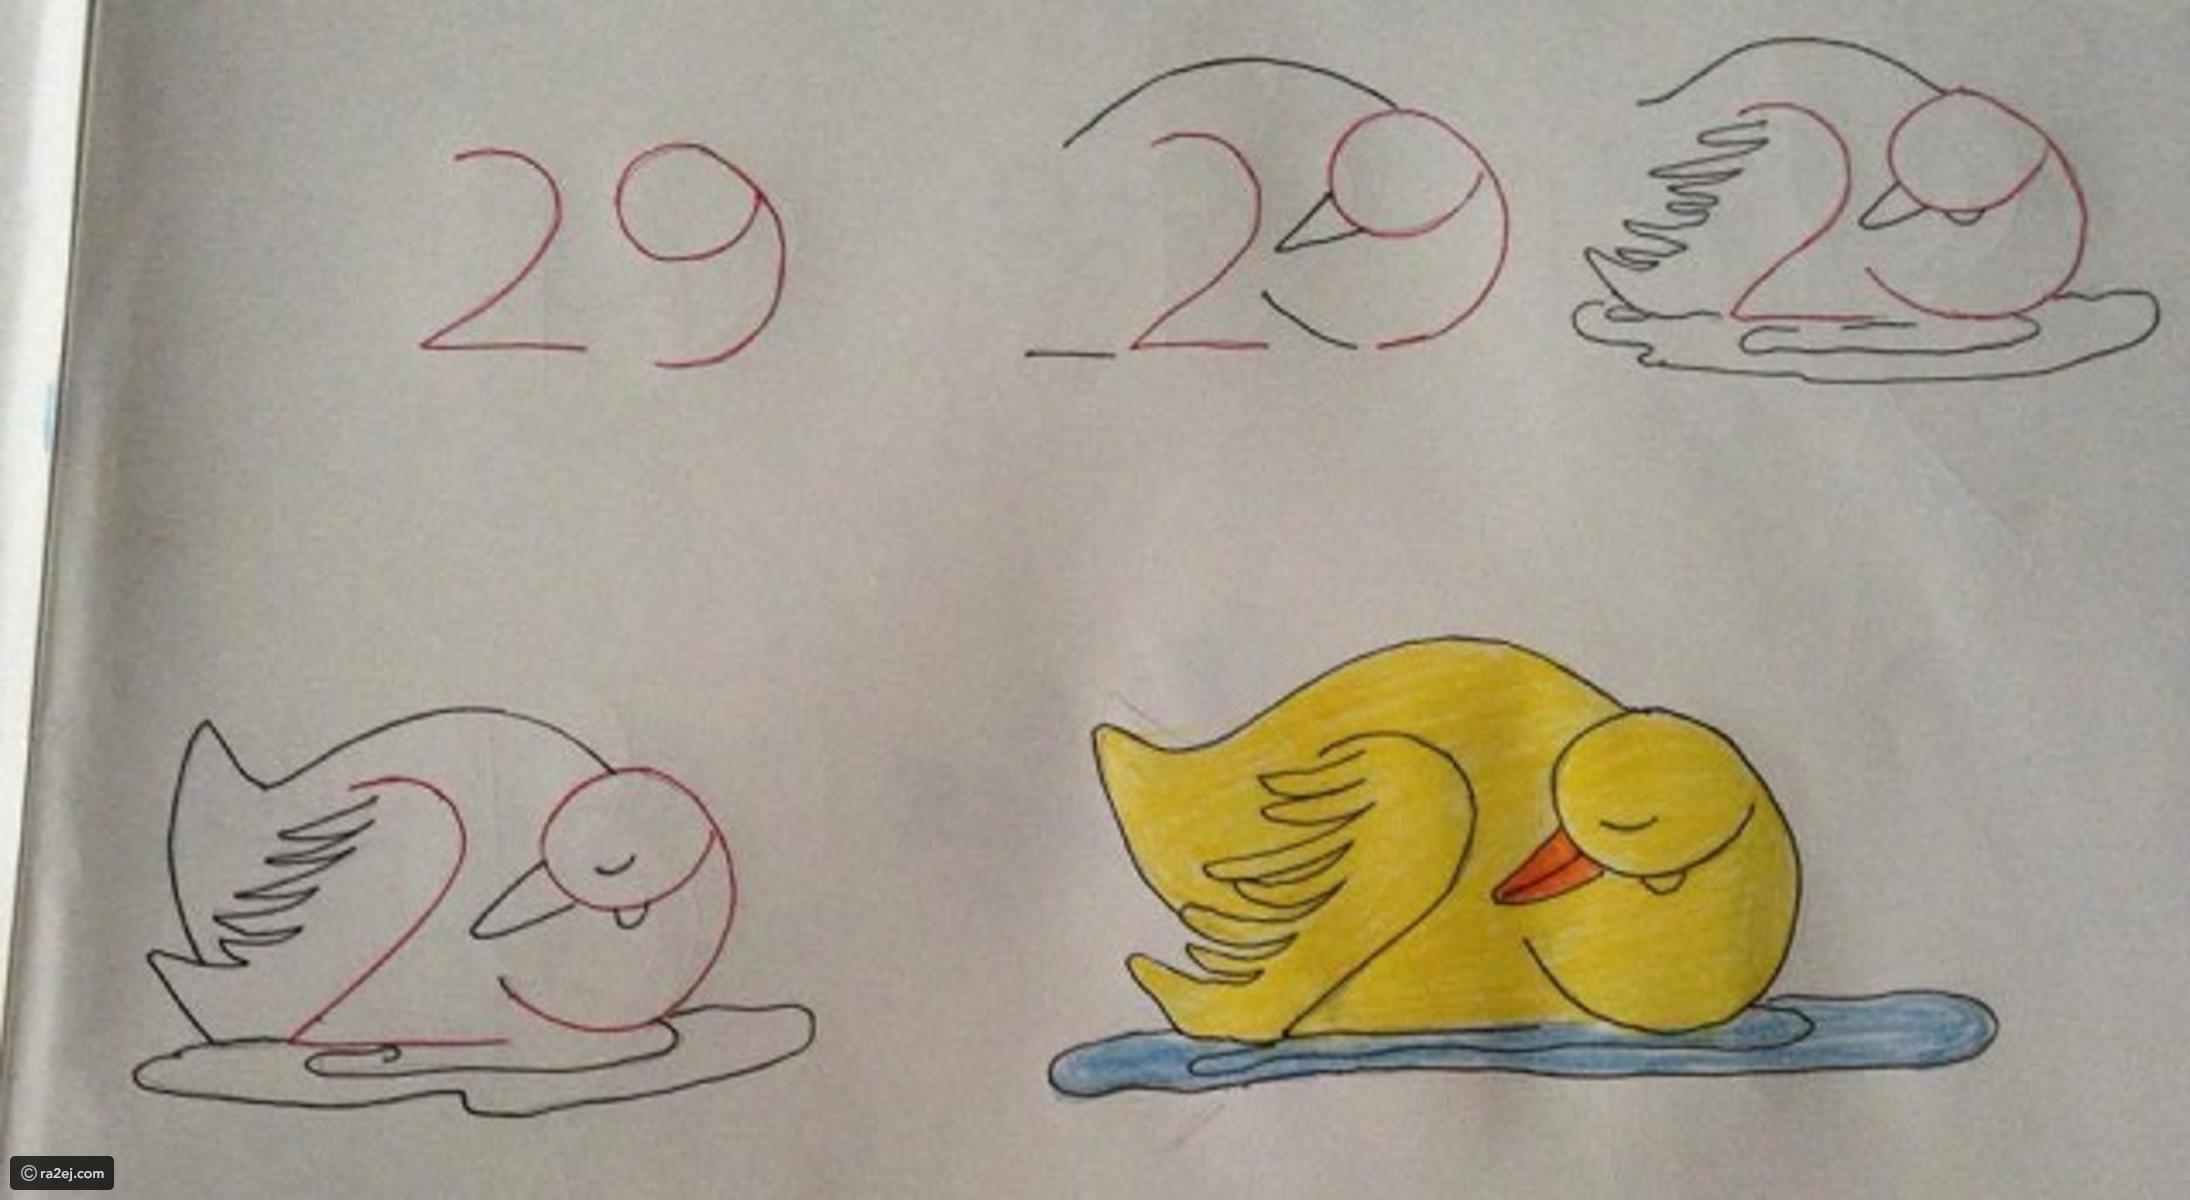 بالصور اجمل رسومات , صور ابداعات الرسومات للاطفال 4085 11